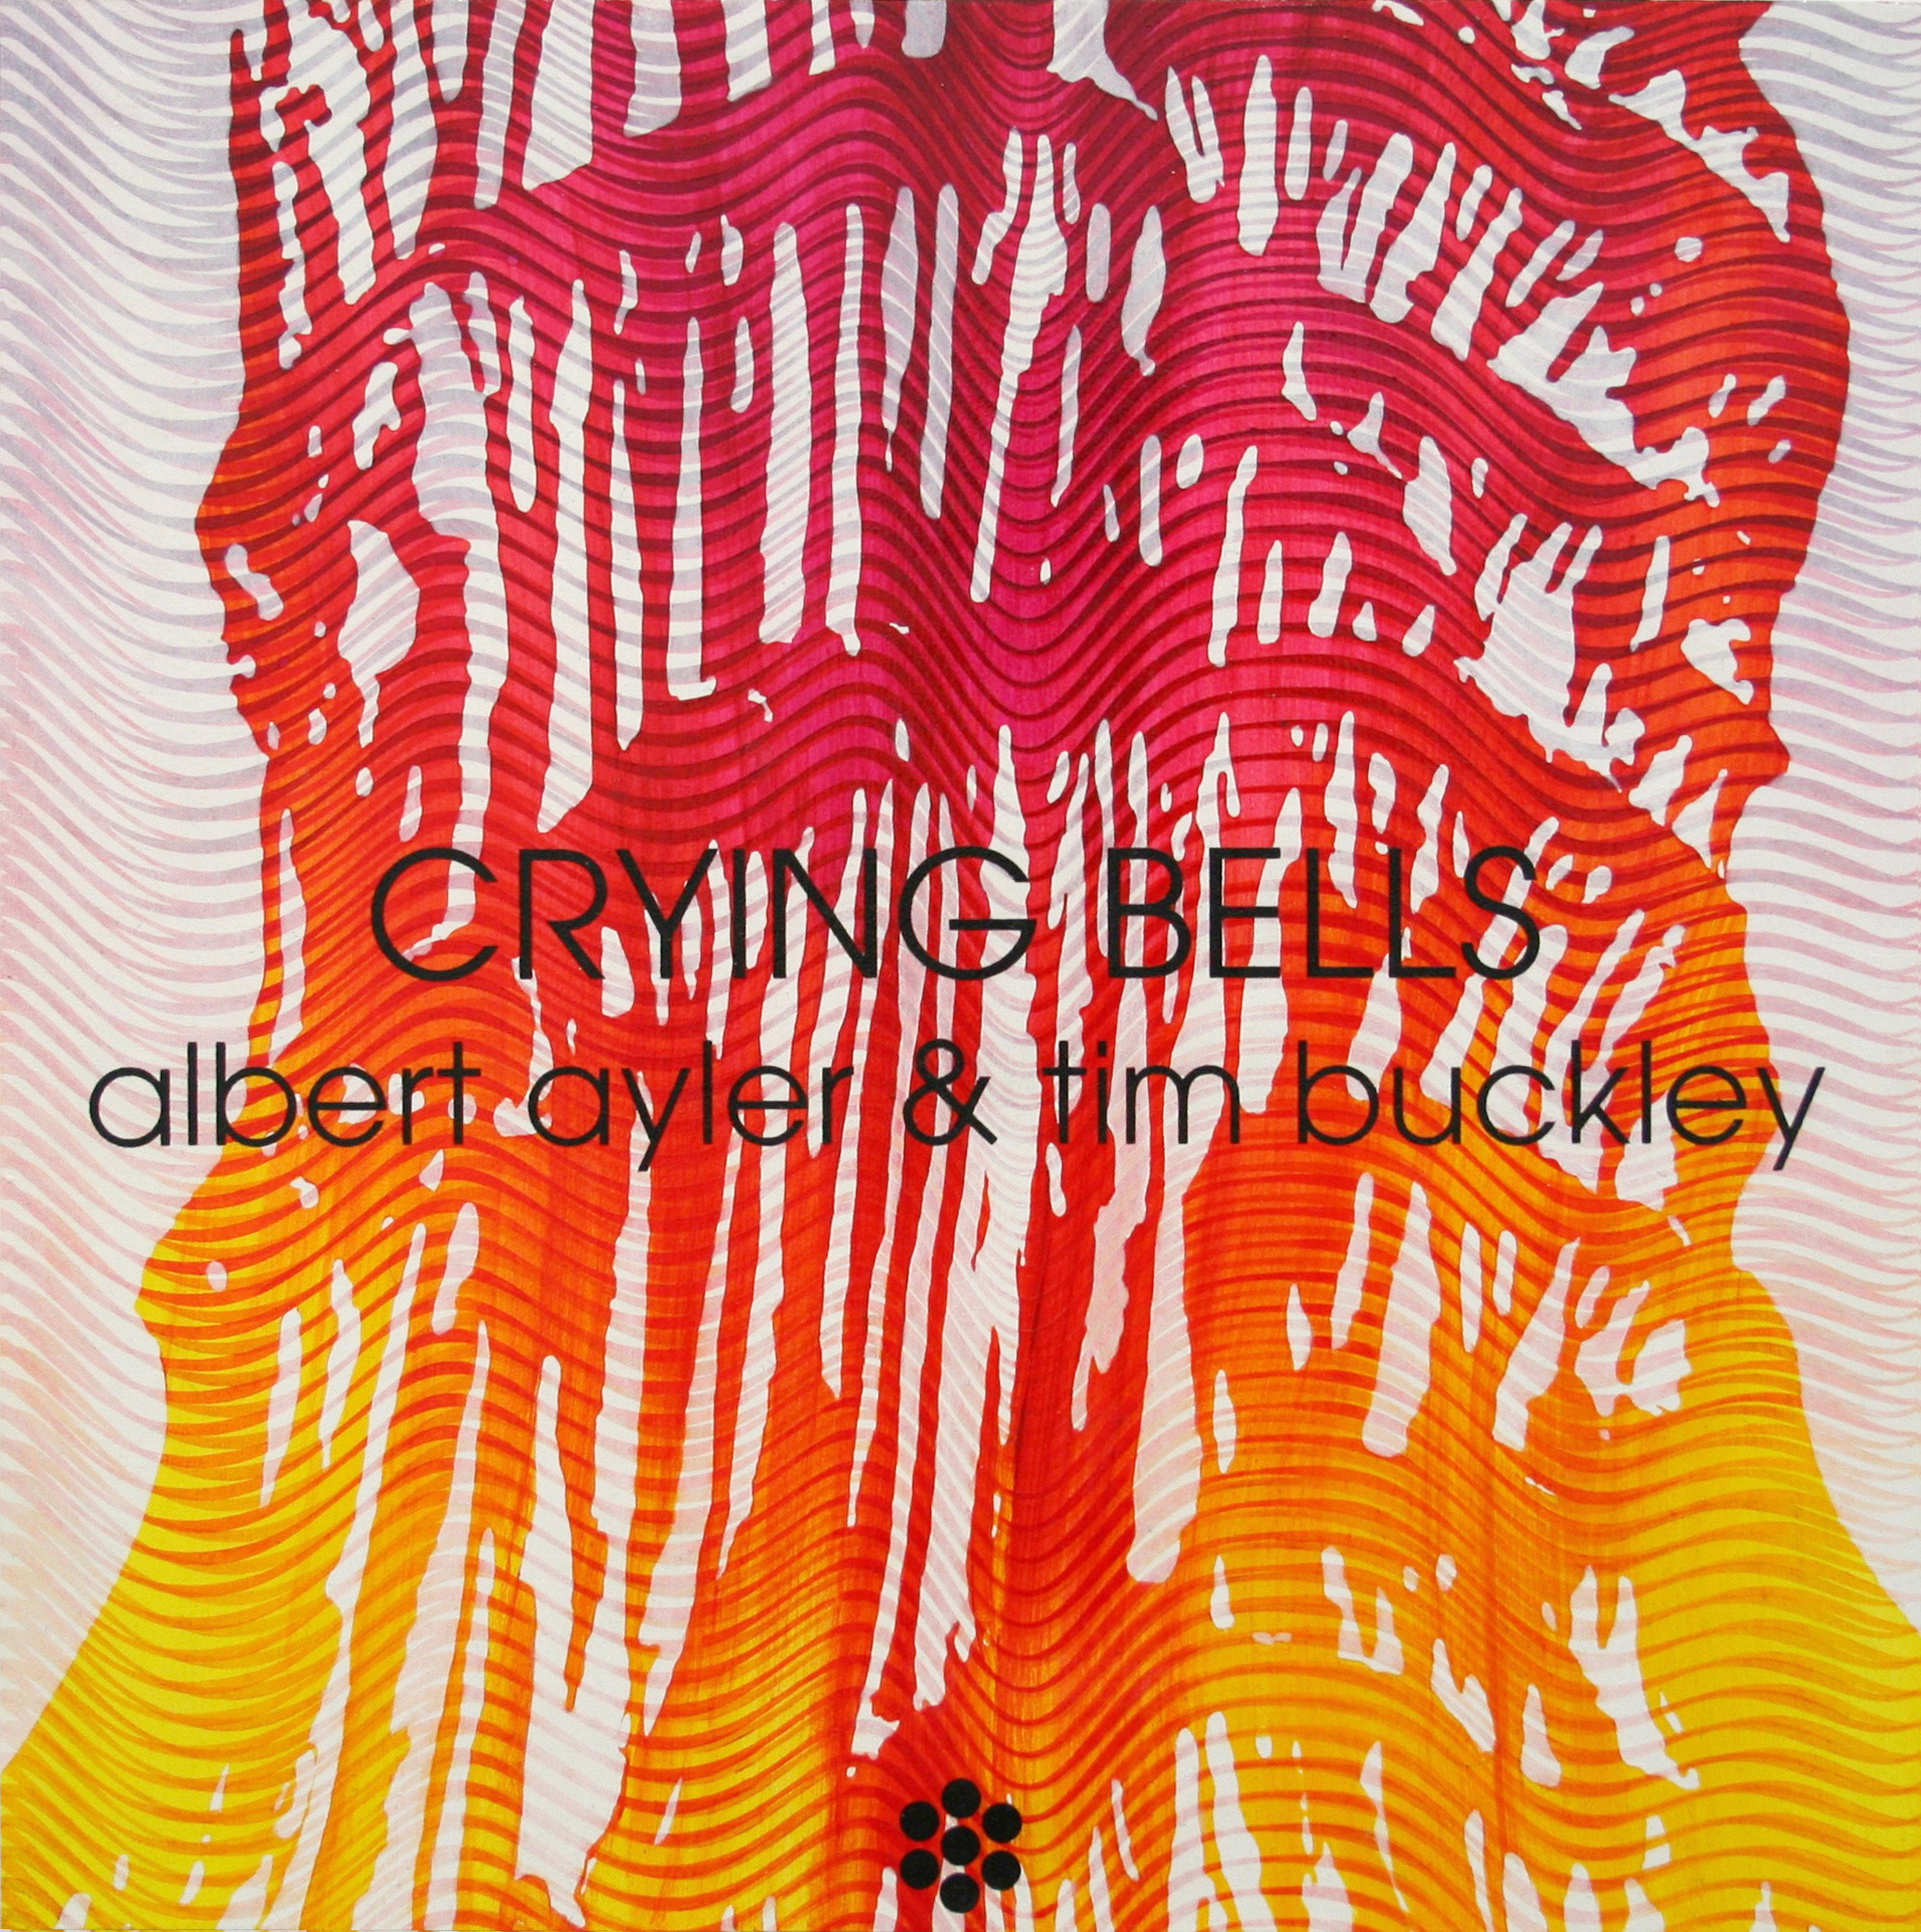 Albert Ayler and Tim Buckley – Crying Bells –  1969